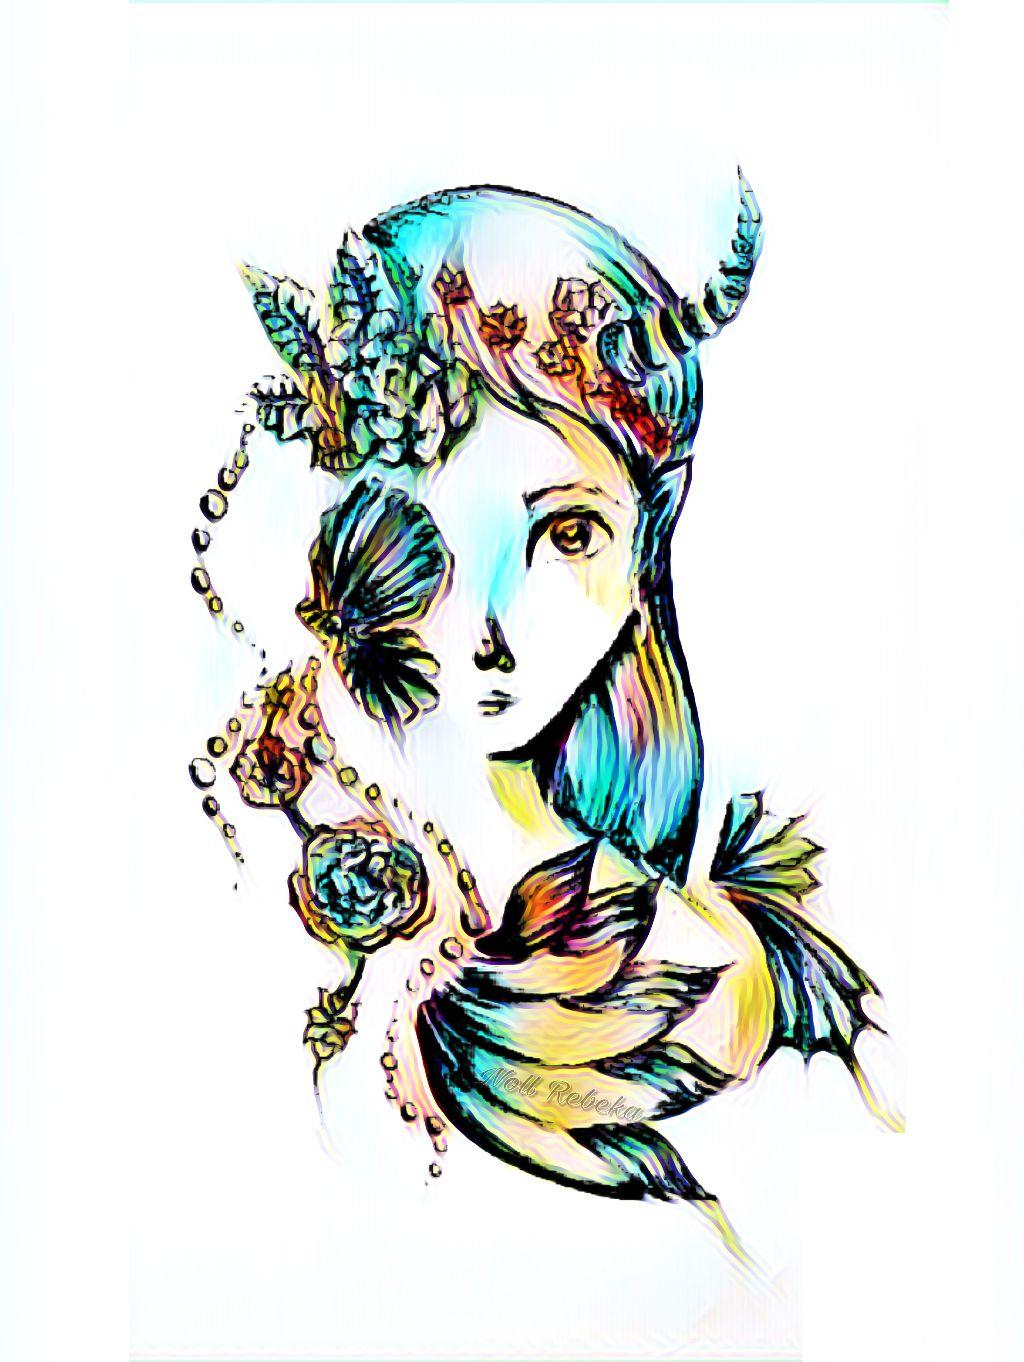 #girl #effect #colorful #drawing #mydrawing #mermaid #shell #blue #rose #random